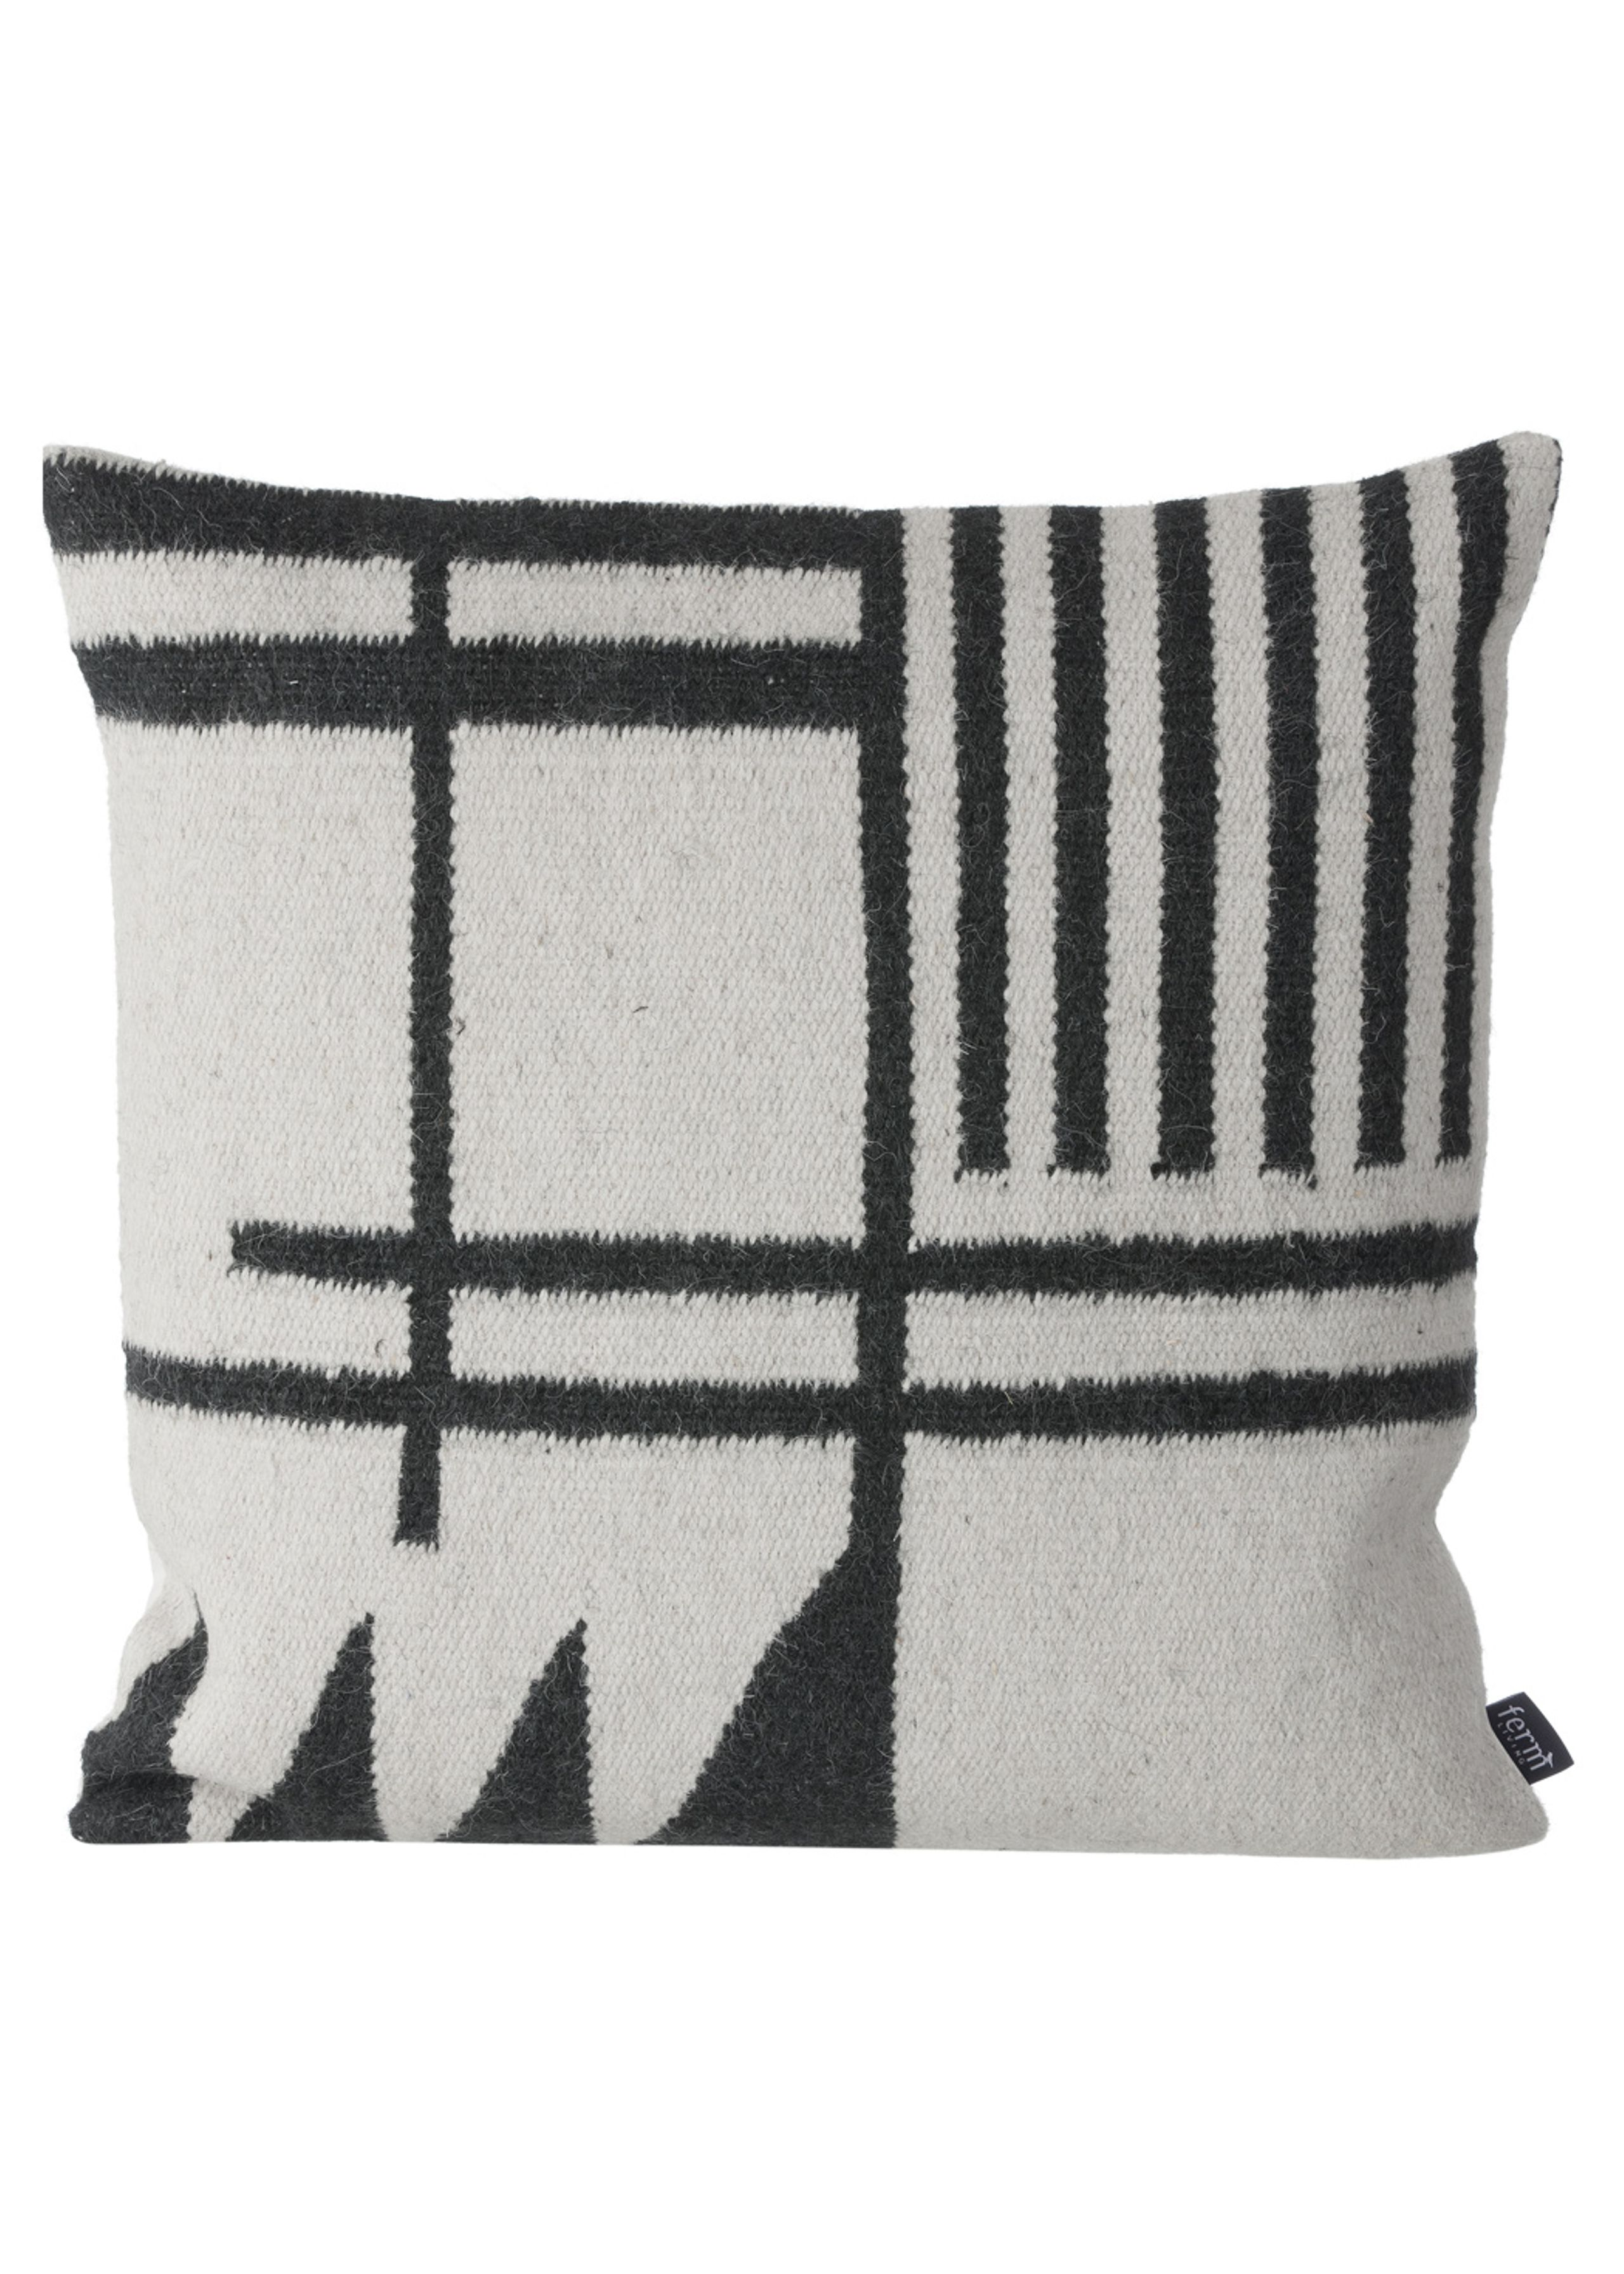 Image of   Kelim Cushion Black Lines